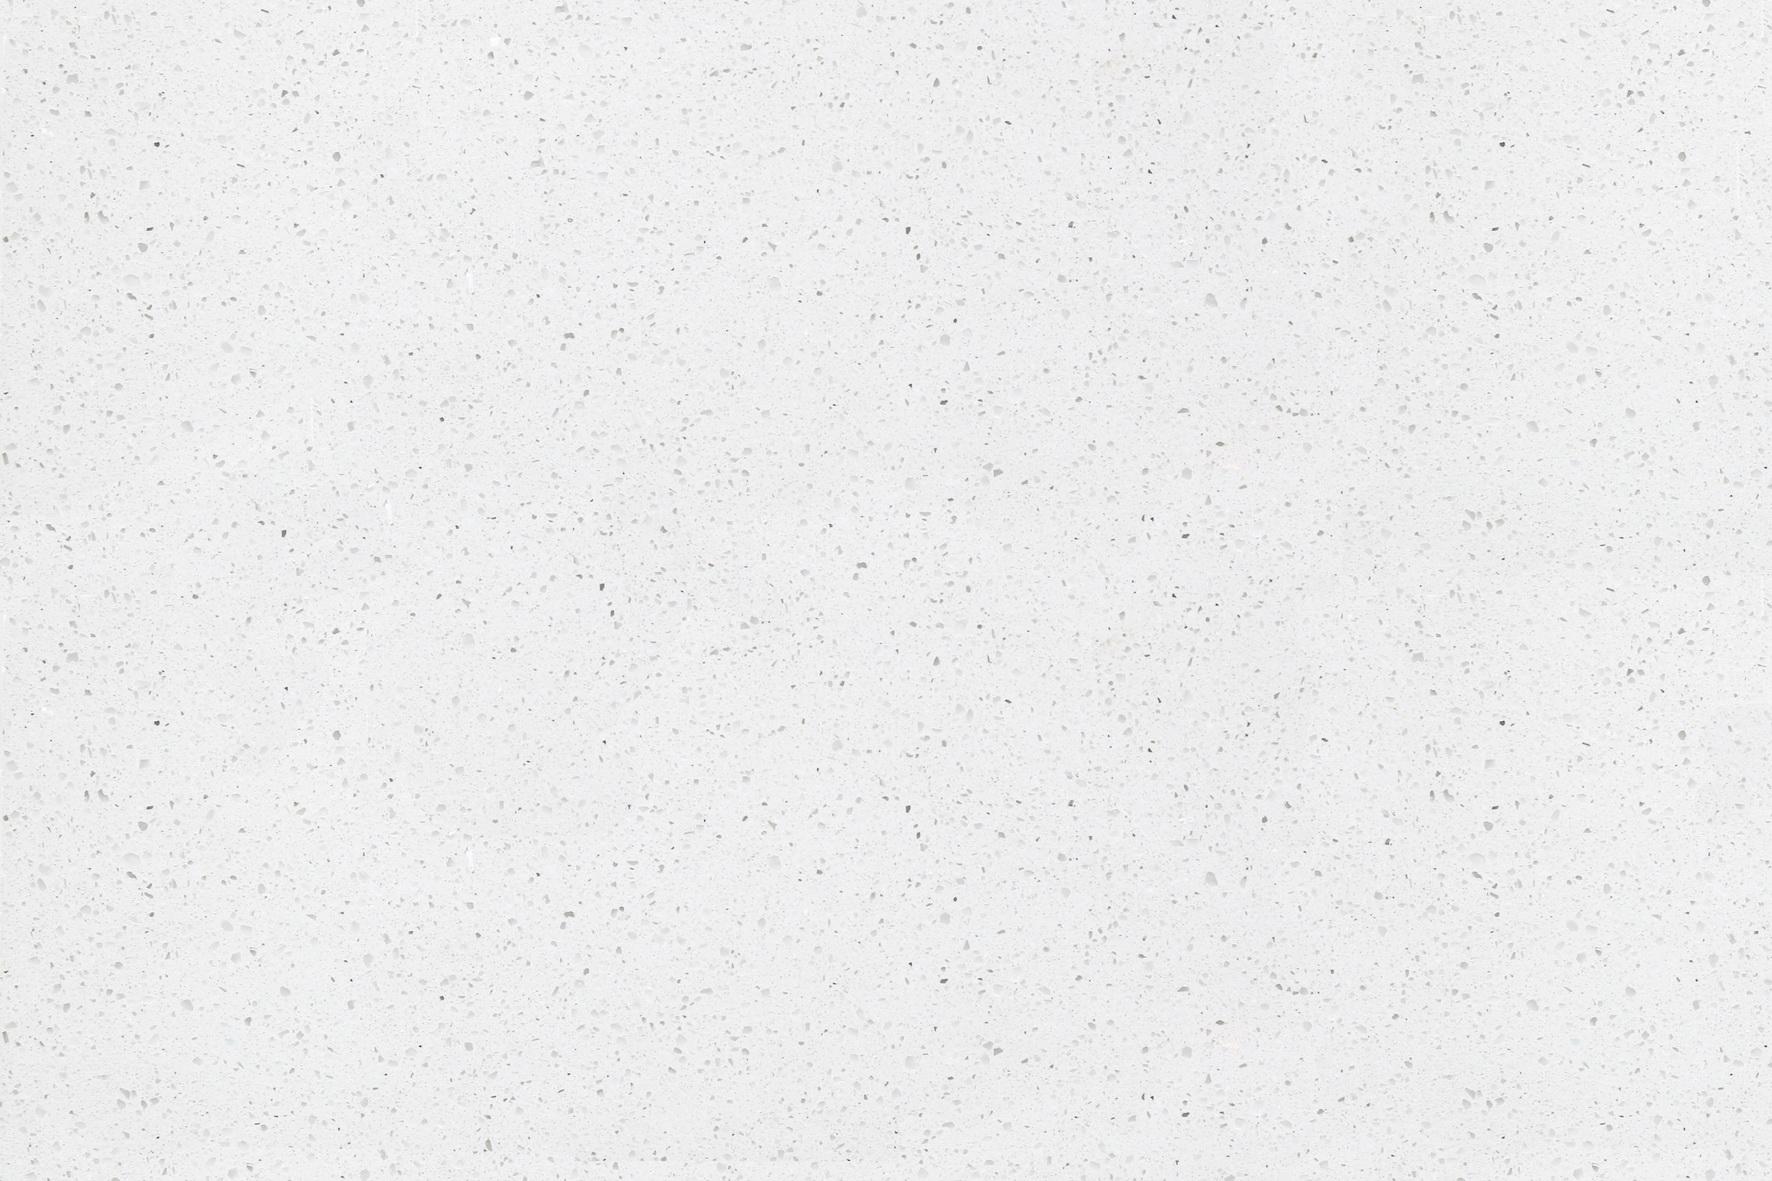 RAINBOW WHITE UNIPLUS UNIPLUS LUCIDE Foto: 1_47750_37641.jpg